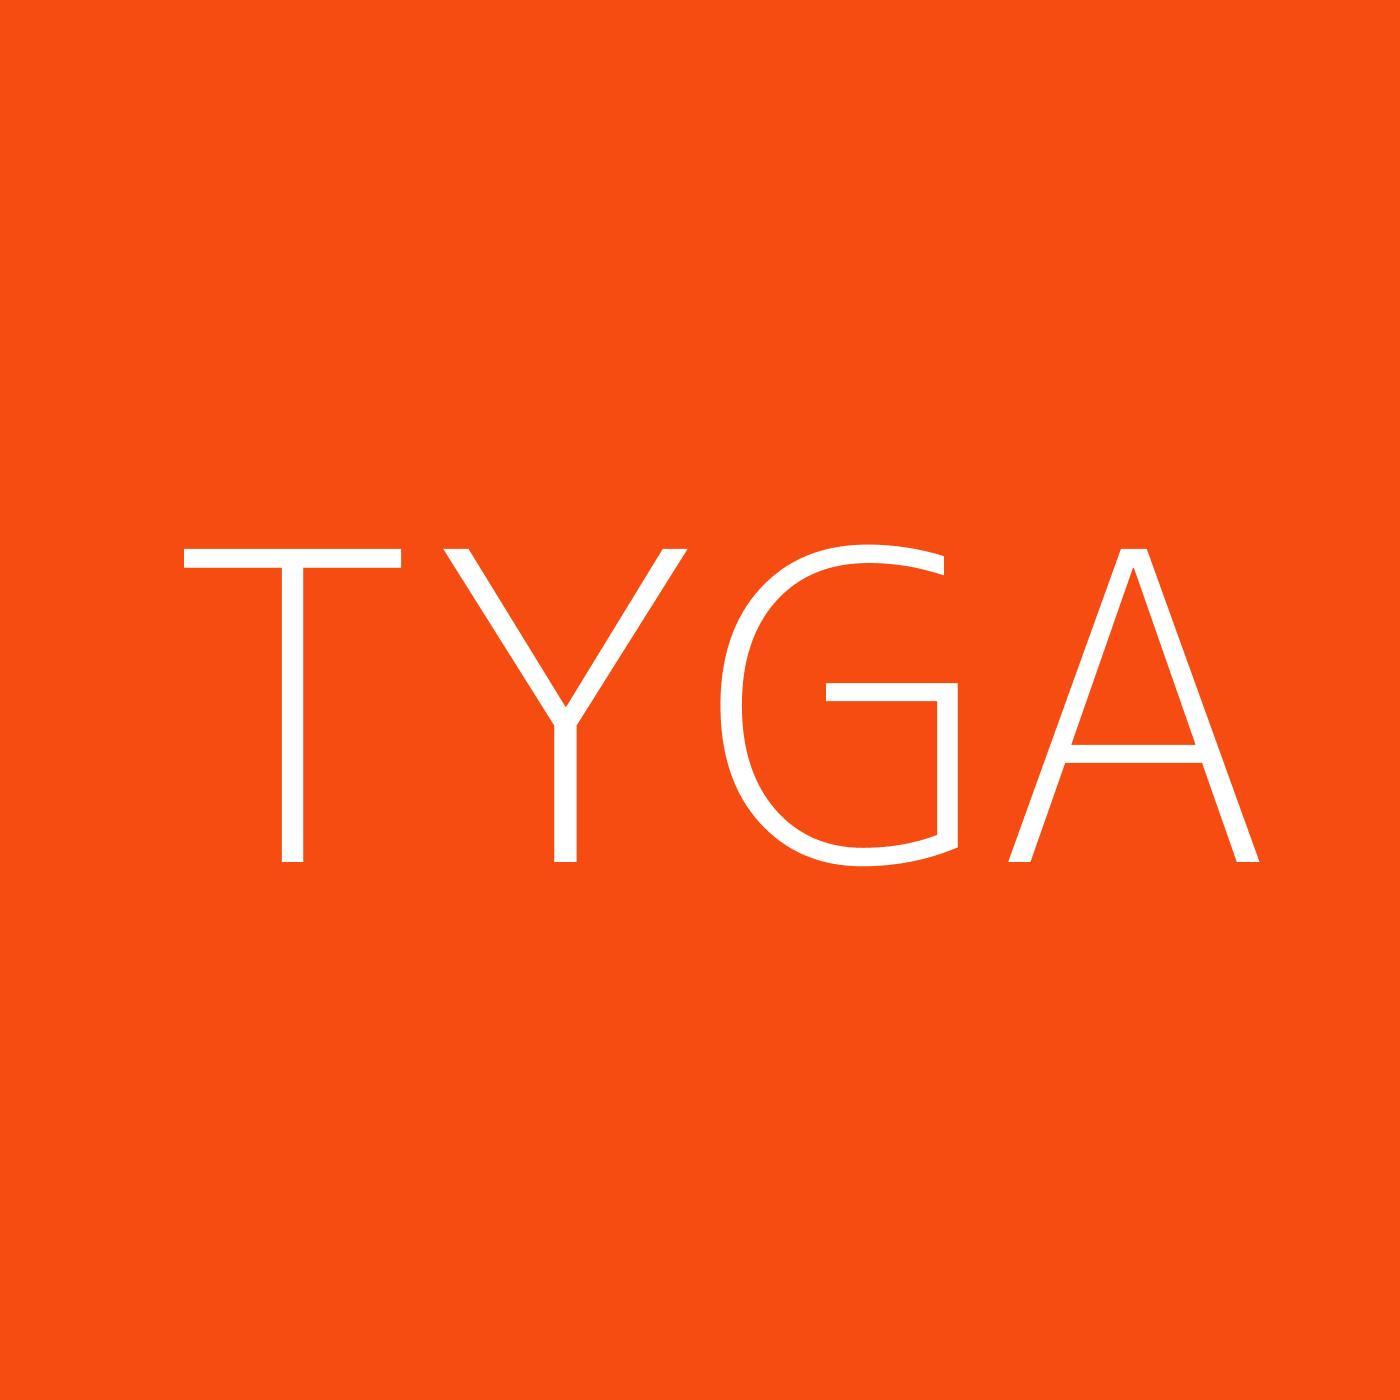 Tyga Playlist Artwork